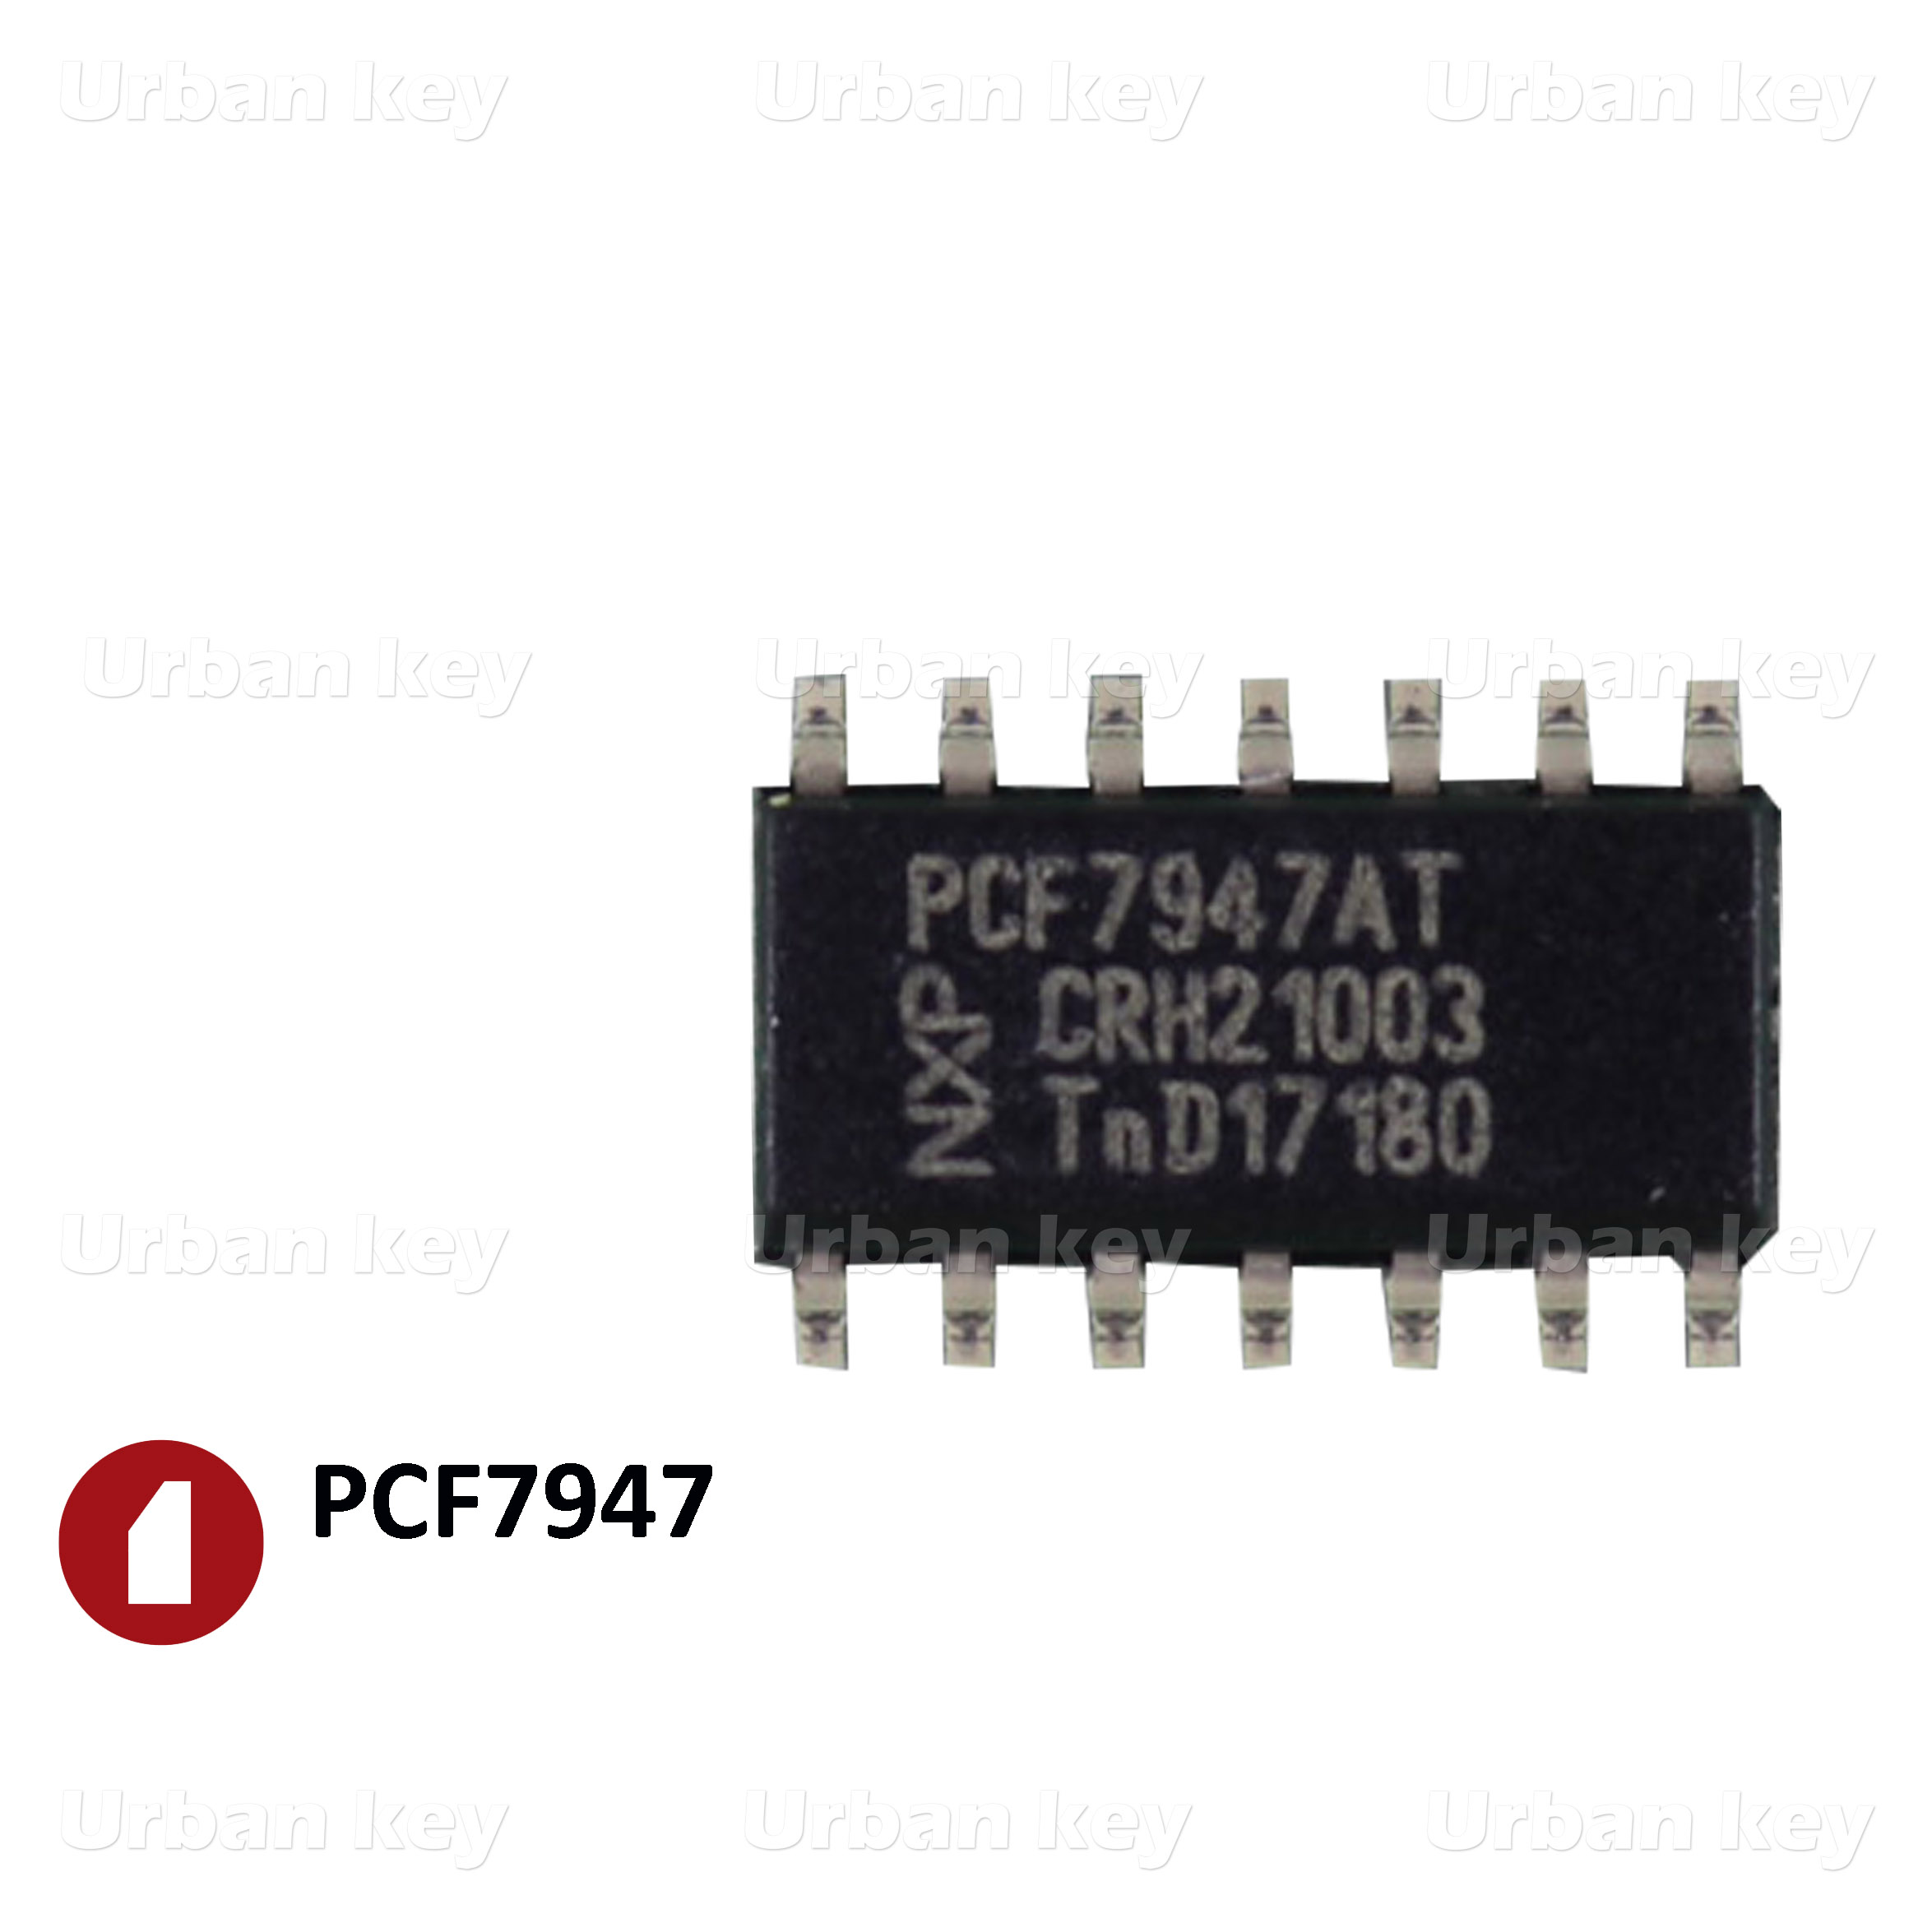 TRANSPONDER PCF 7947